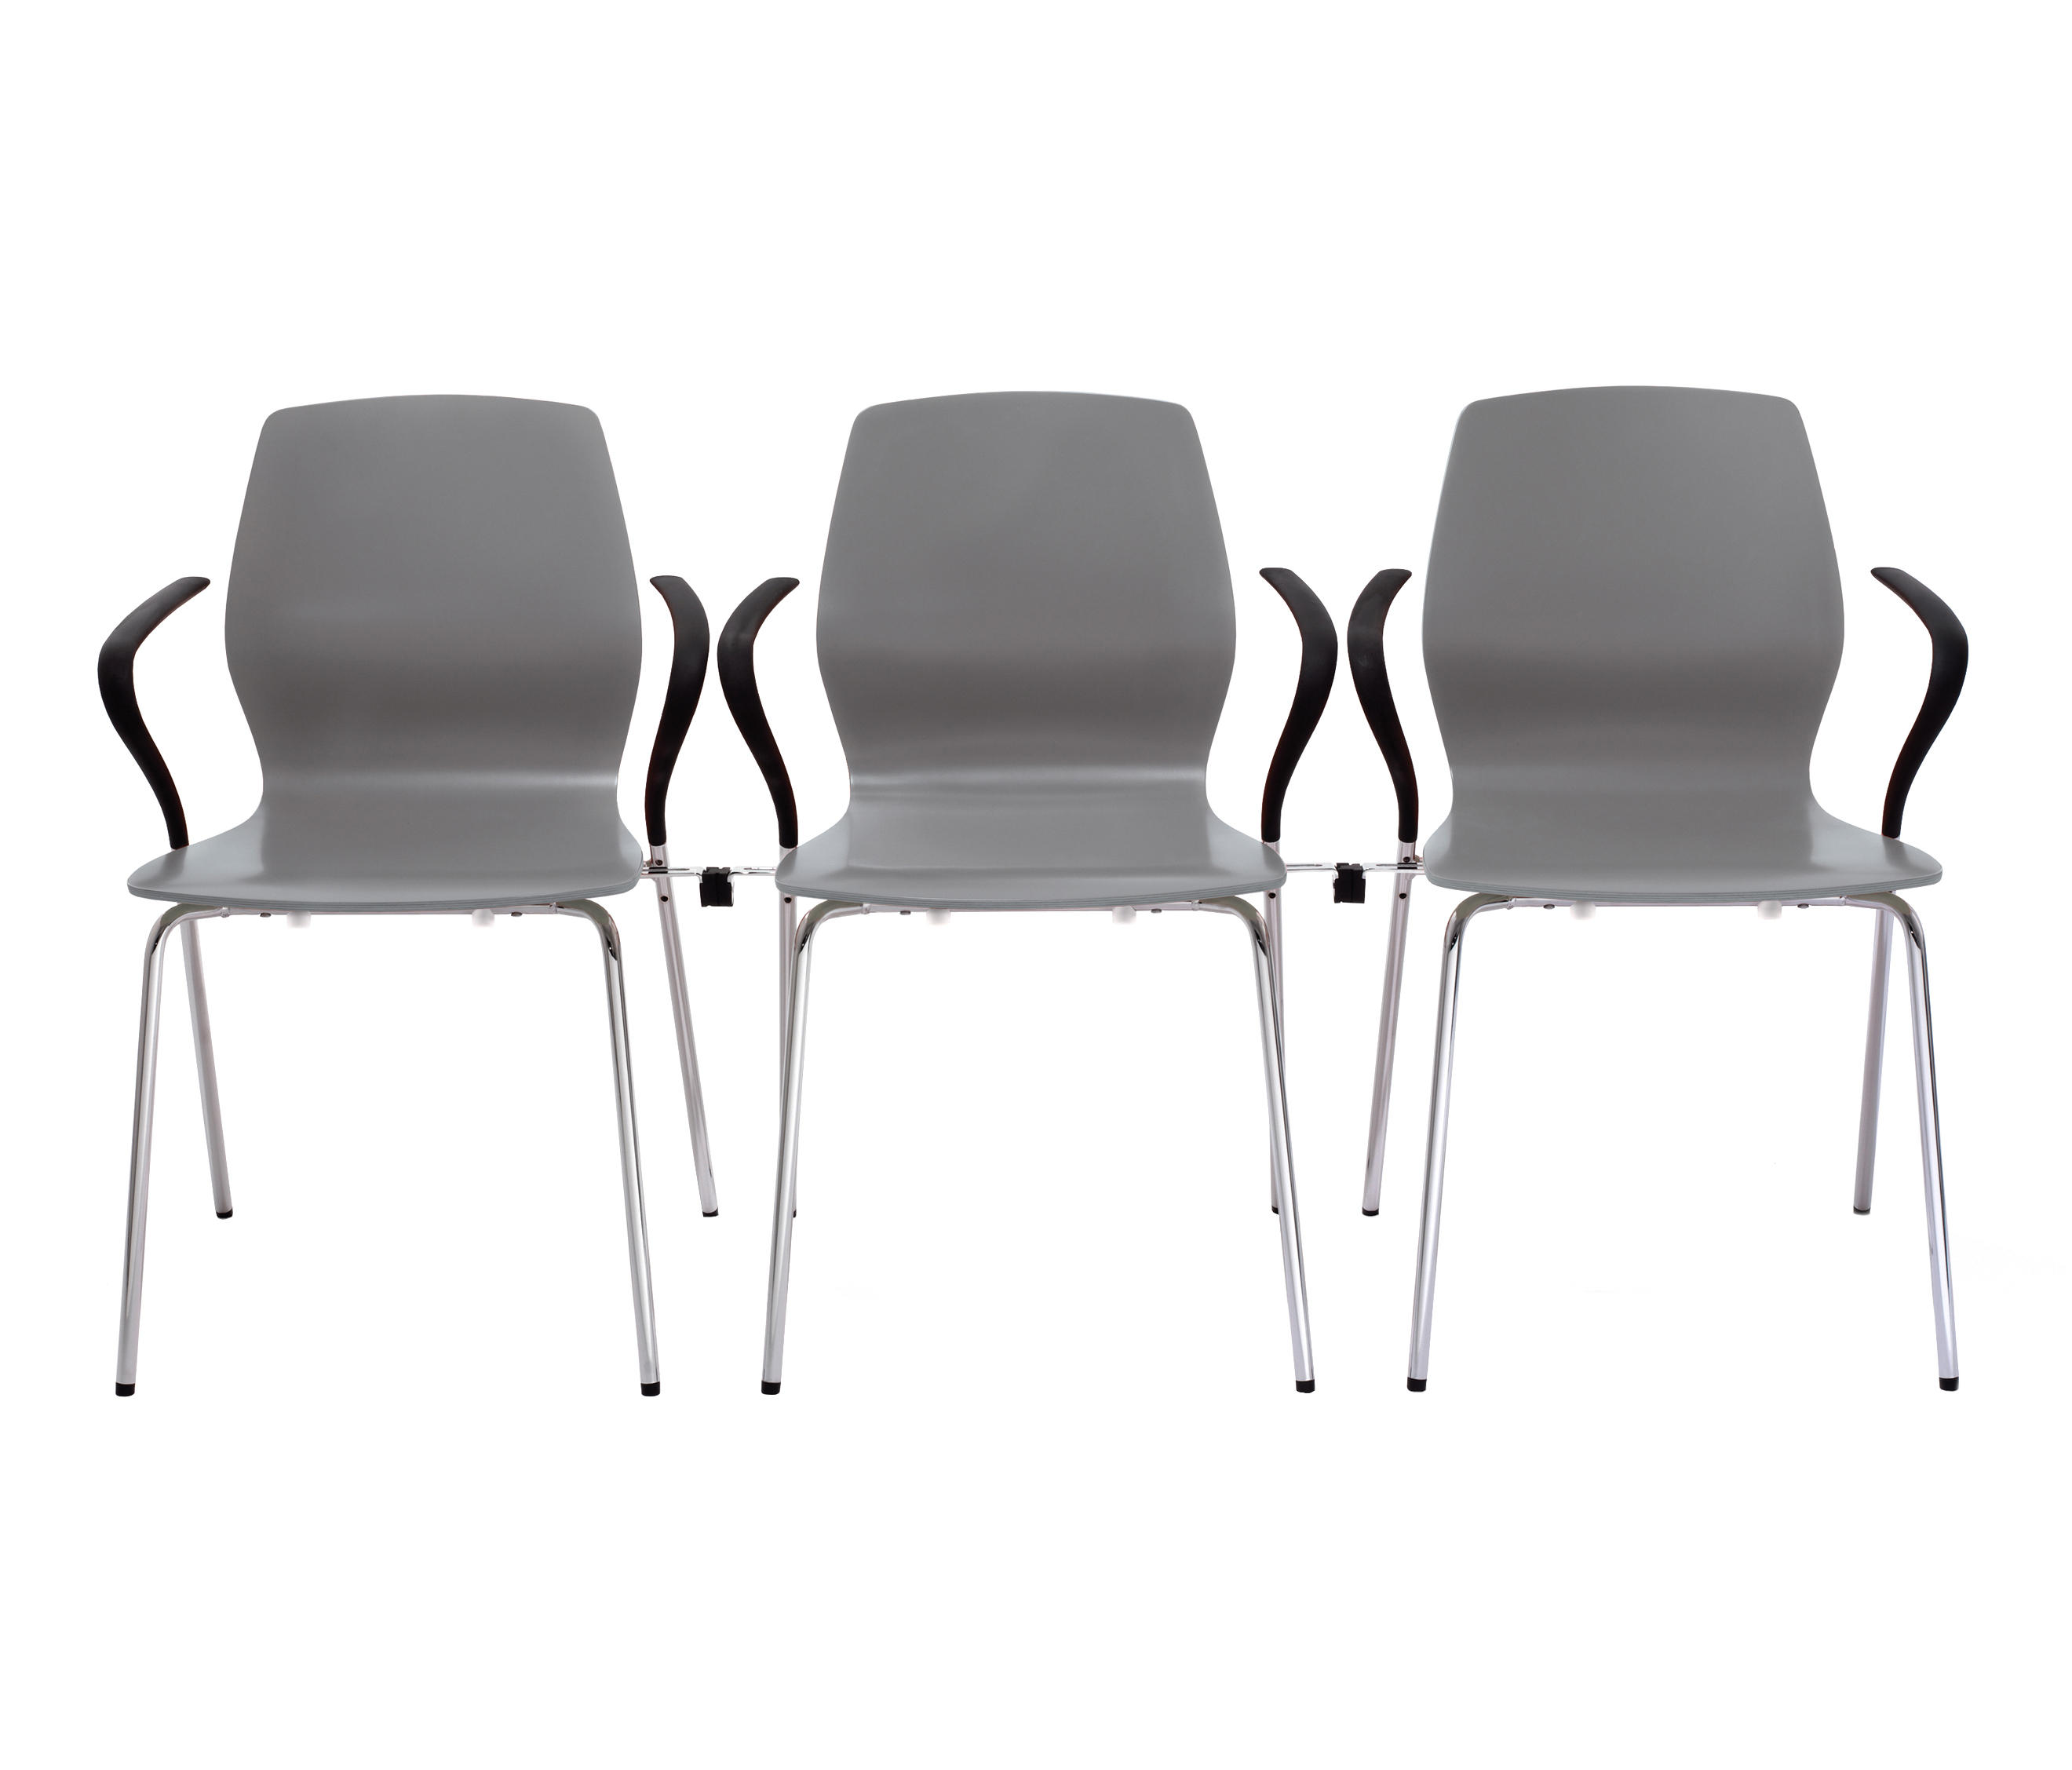 Mezzo sillas de visita de bene architonic for Sillas para visitas